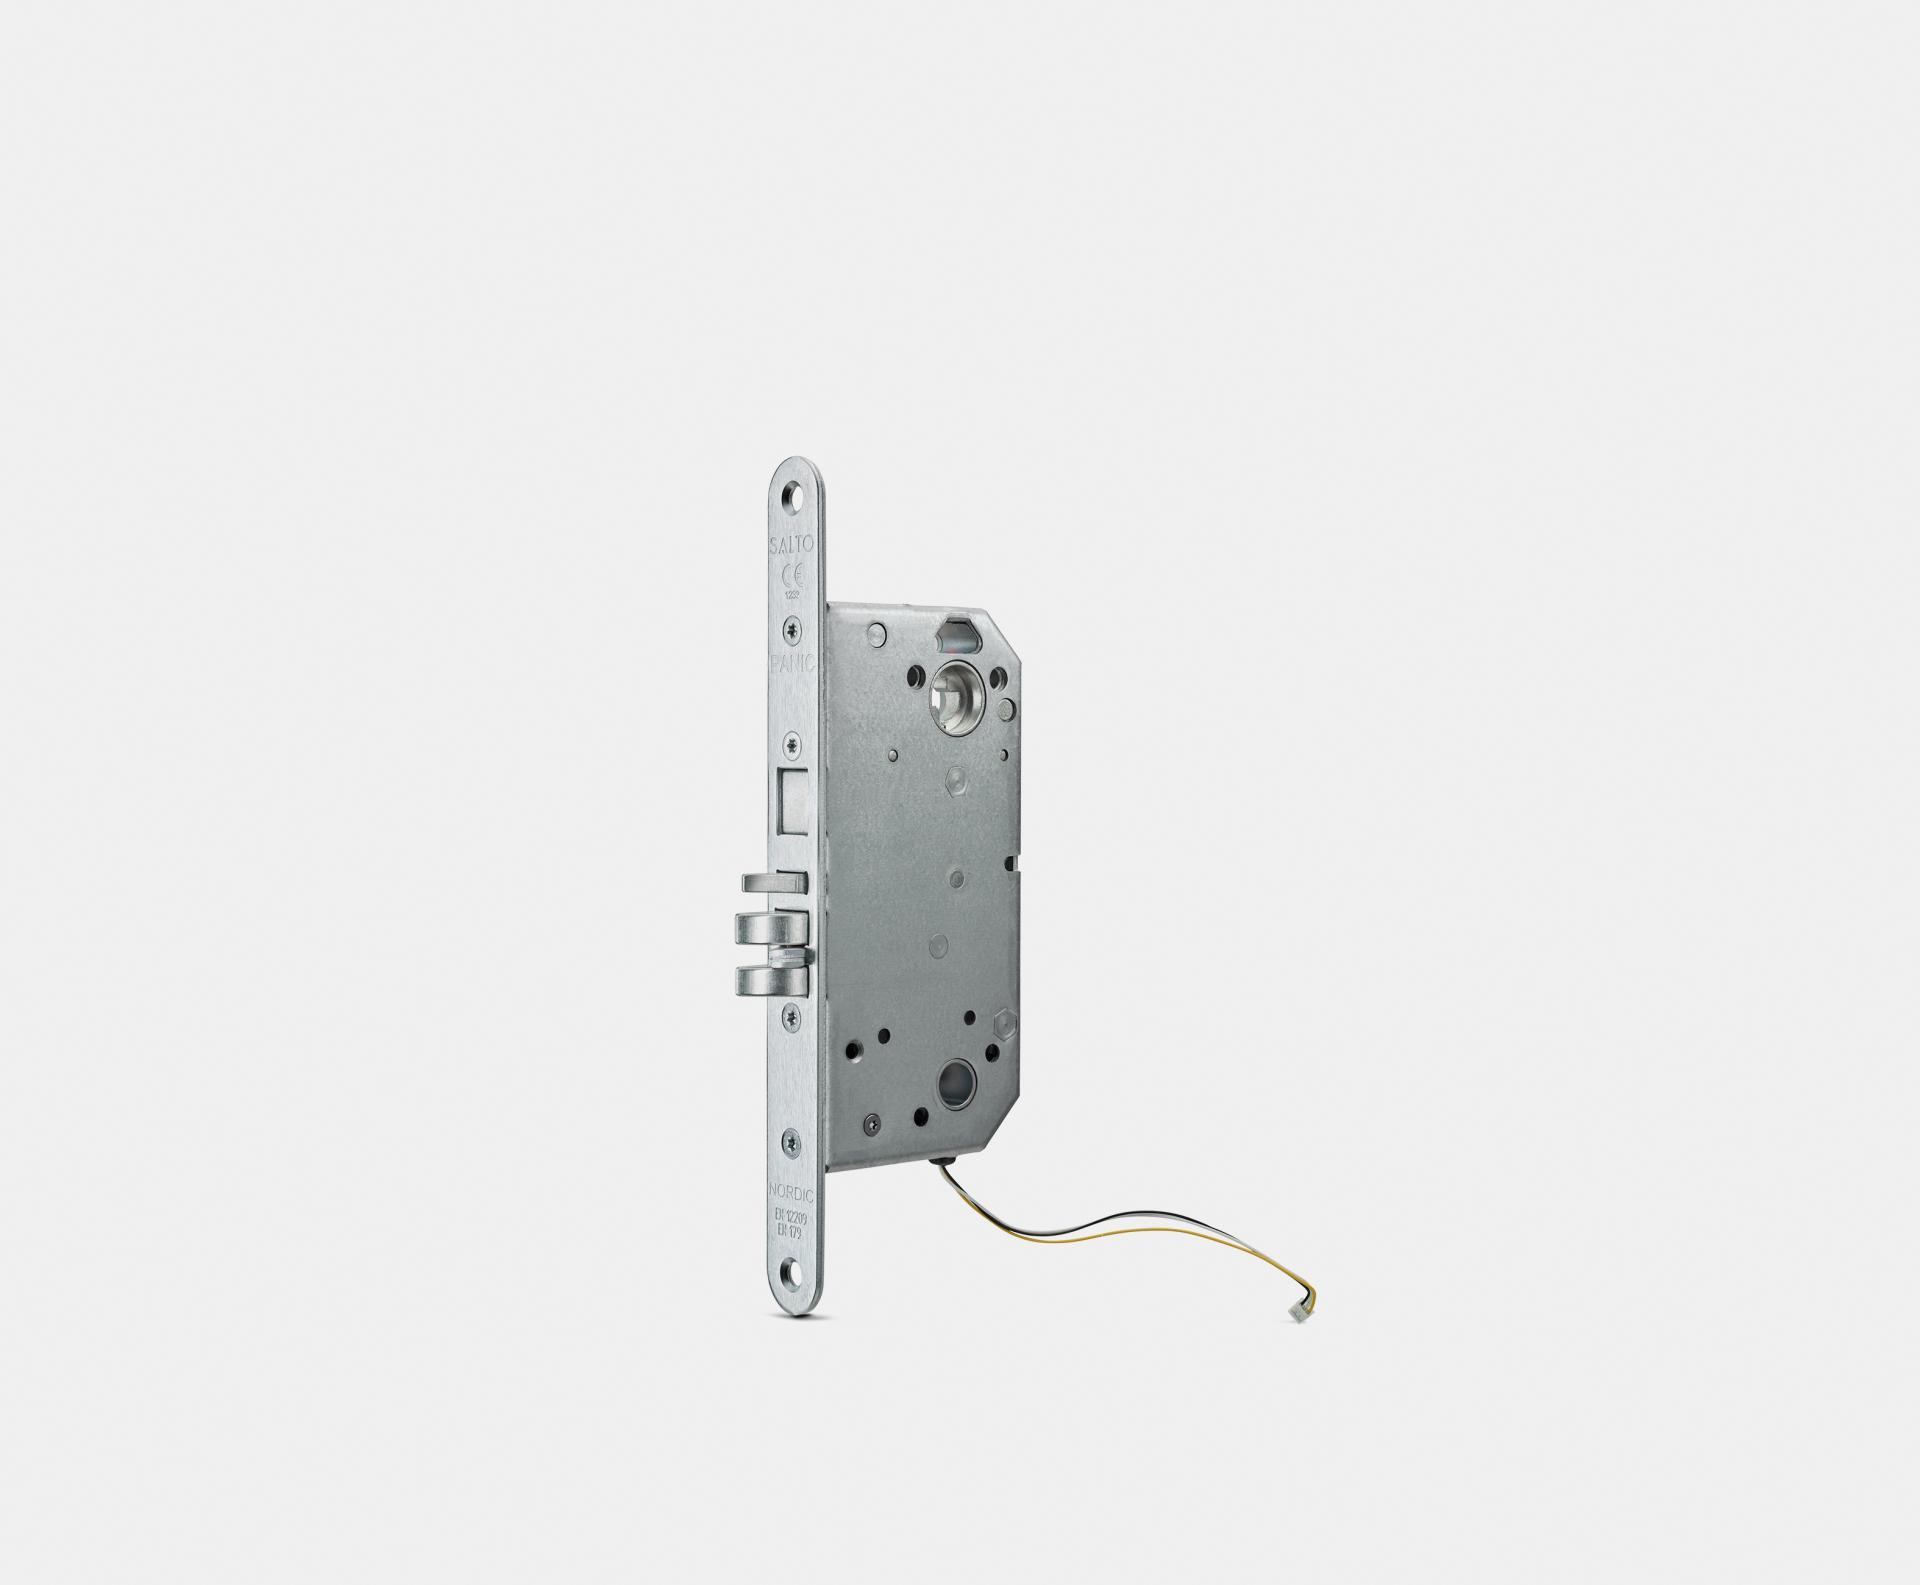 LS5N-mortise-lock-satin-stainless